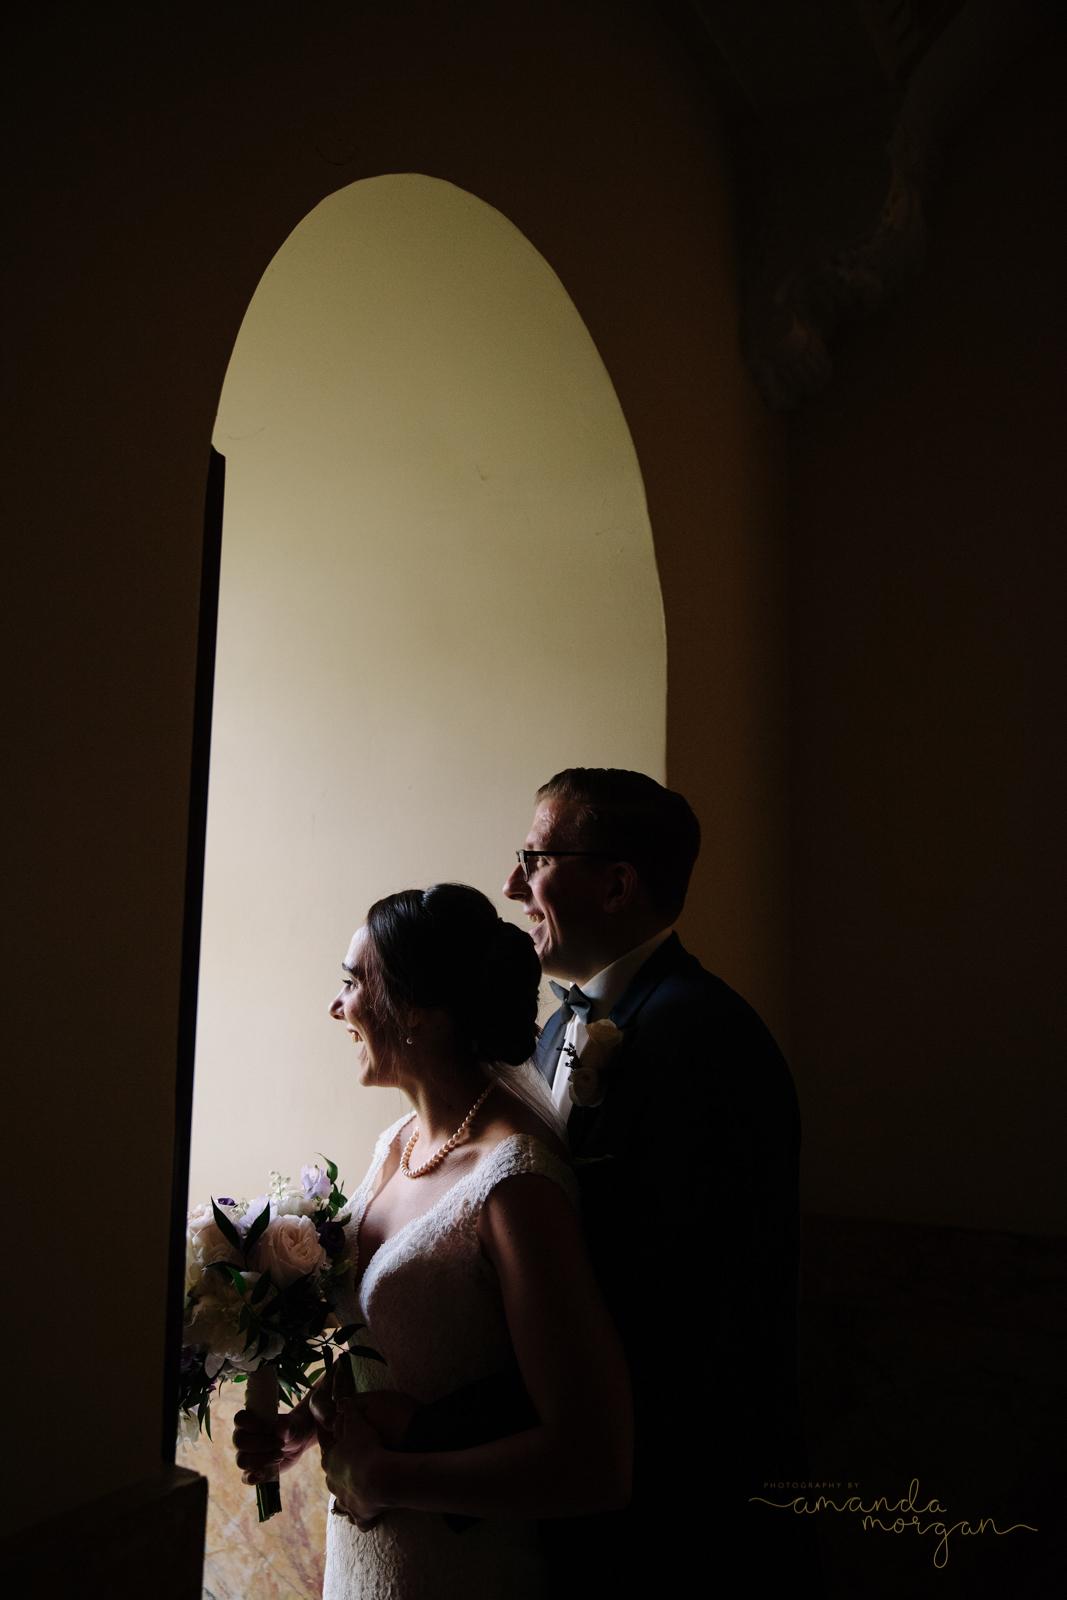 Notre-Dame-Catholic-Church-Wedding-Amanda-Morgan-14.jpg